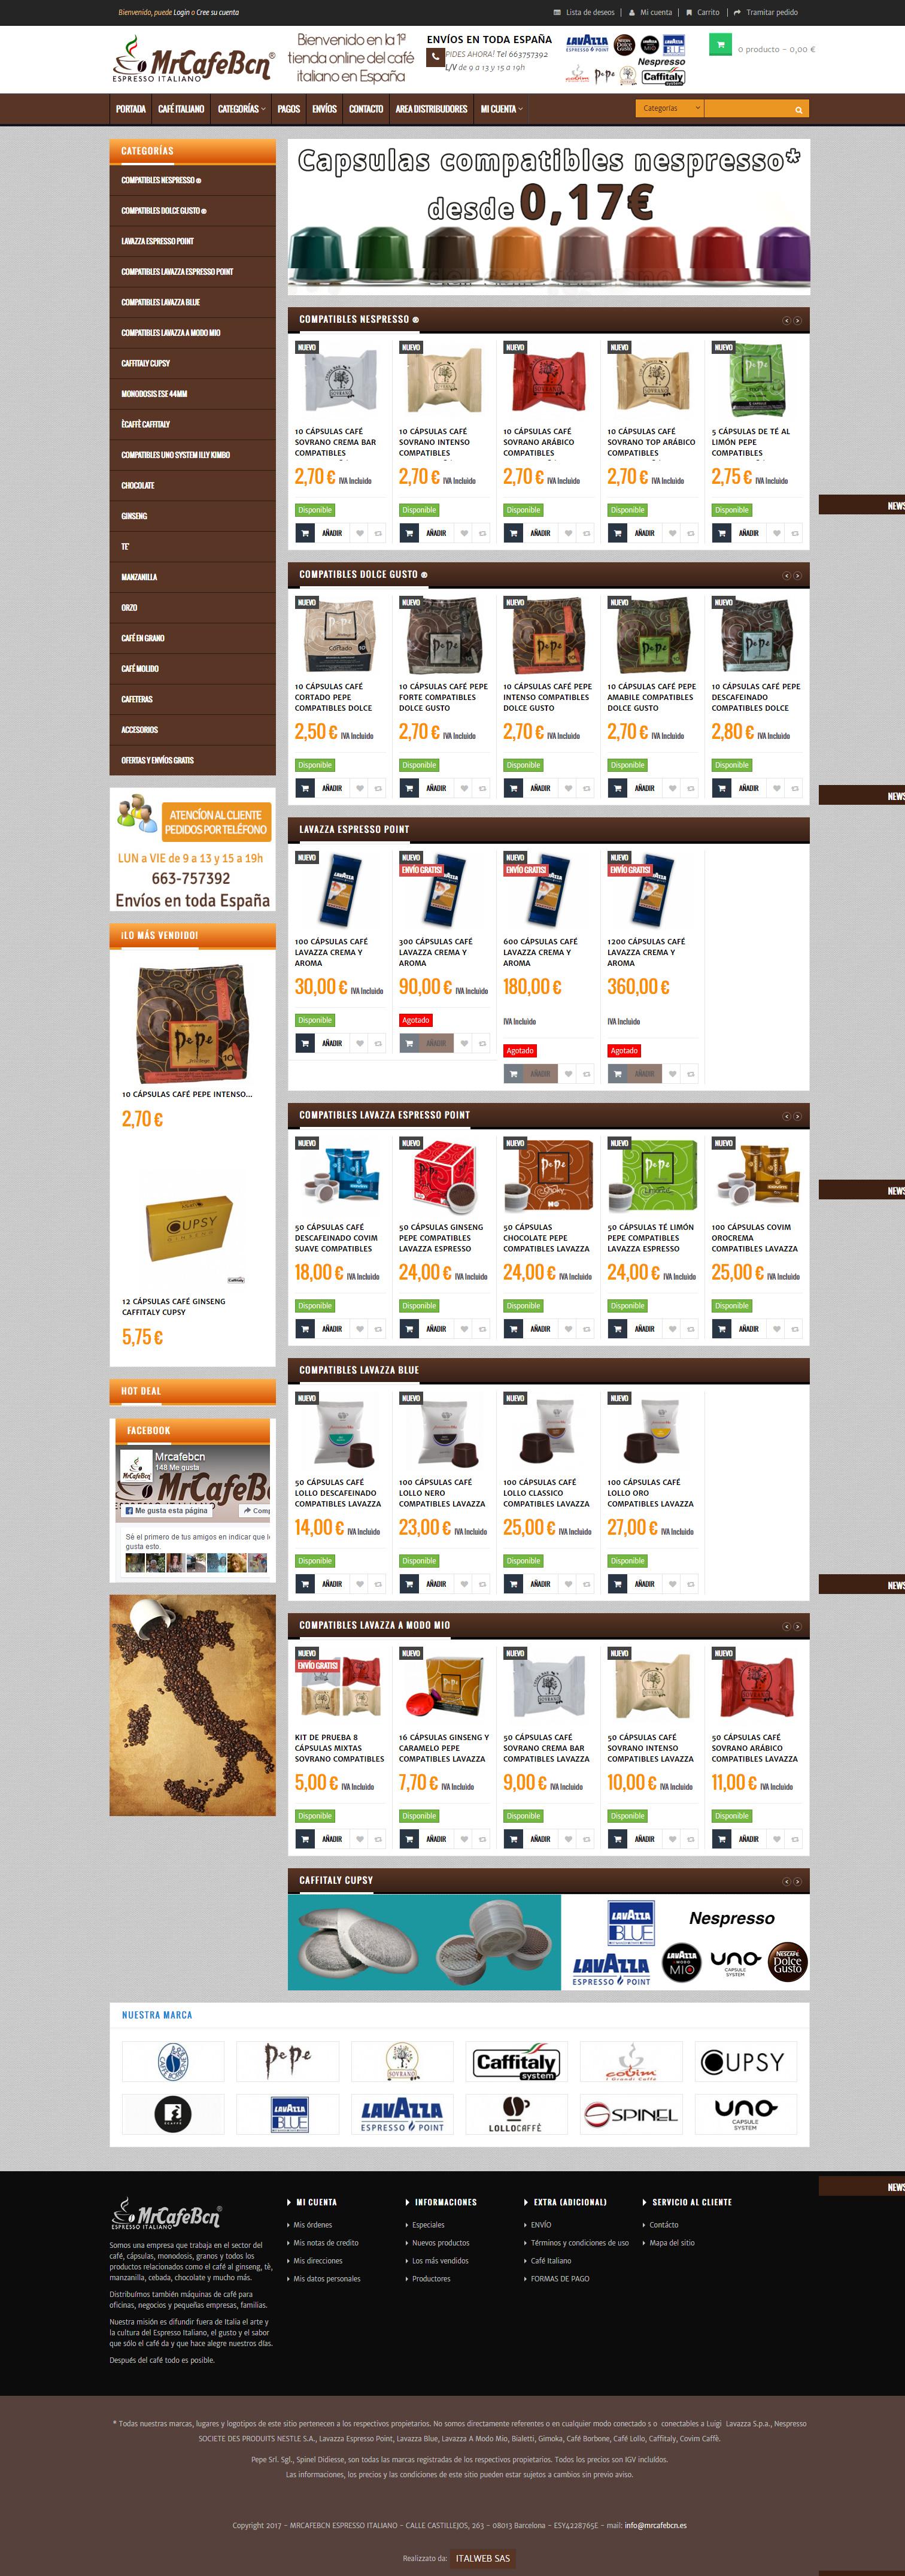 Mr Cafè Bcn - E-commerce